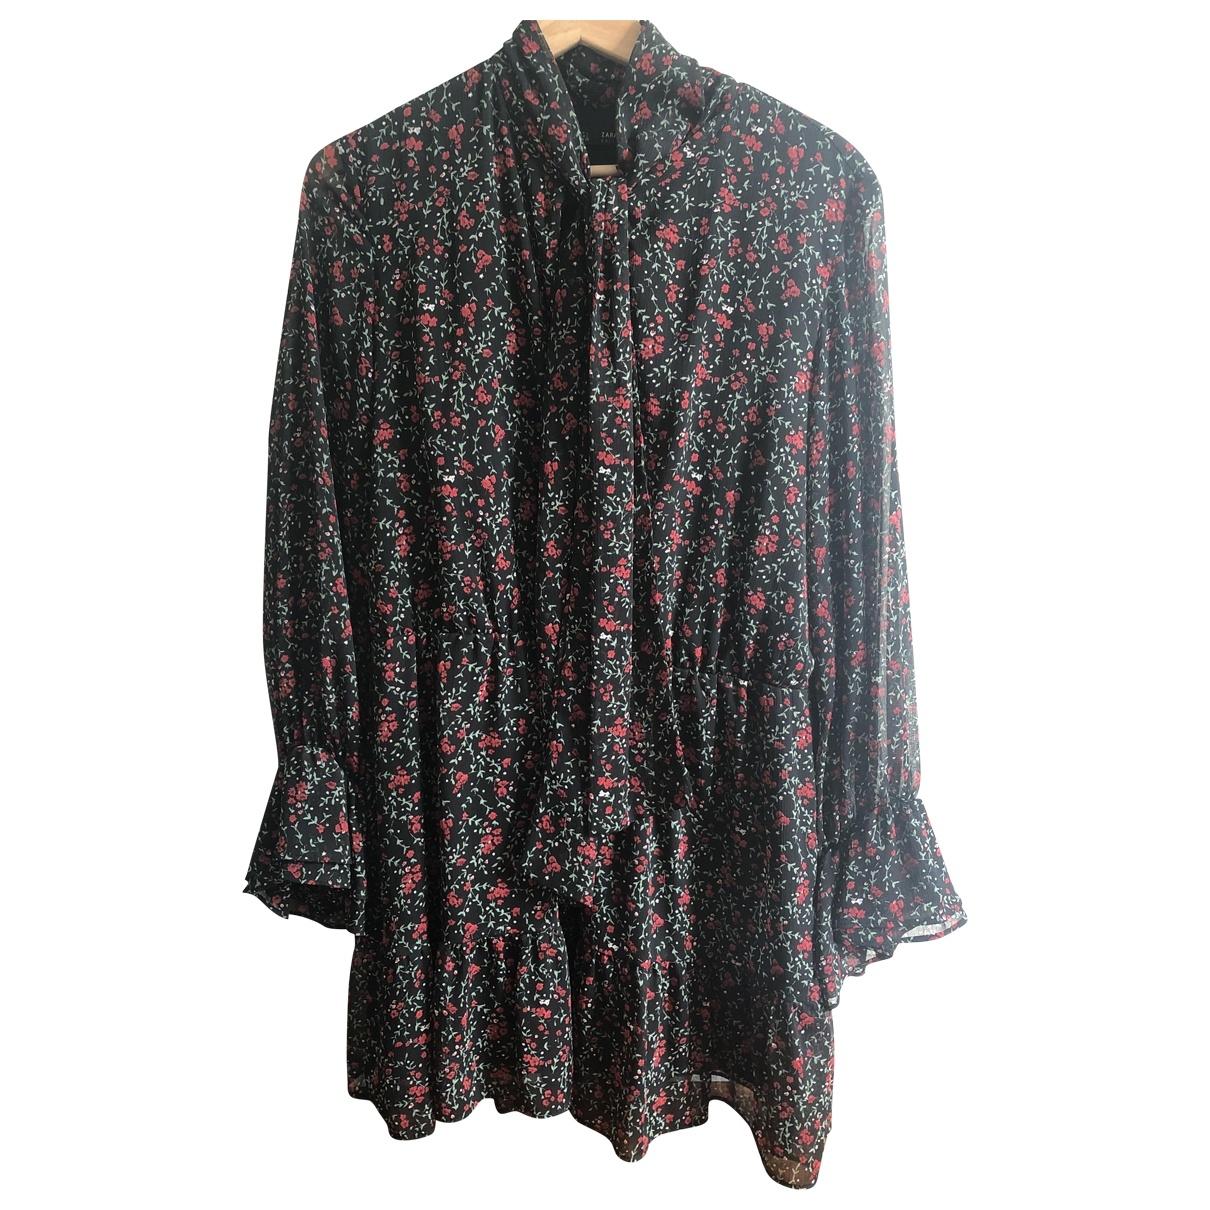 Zara \N Black dress for Women L International